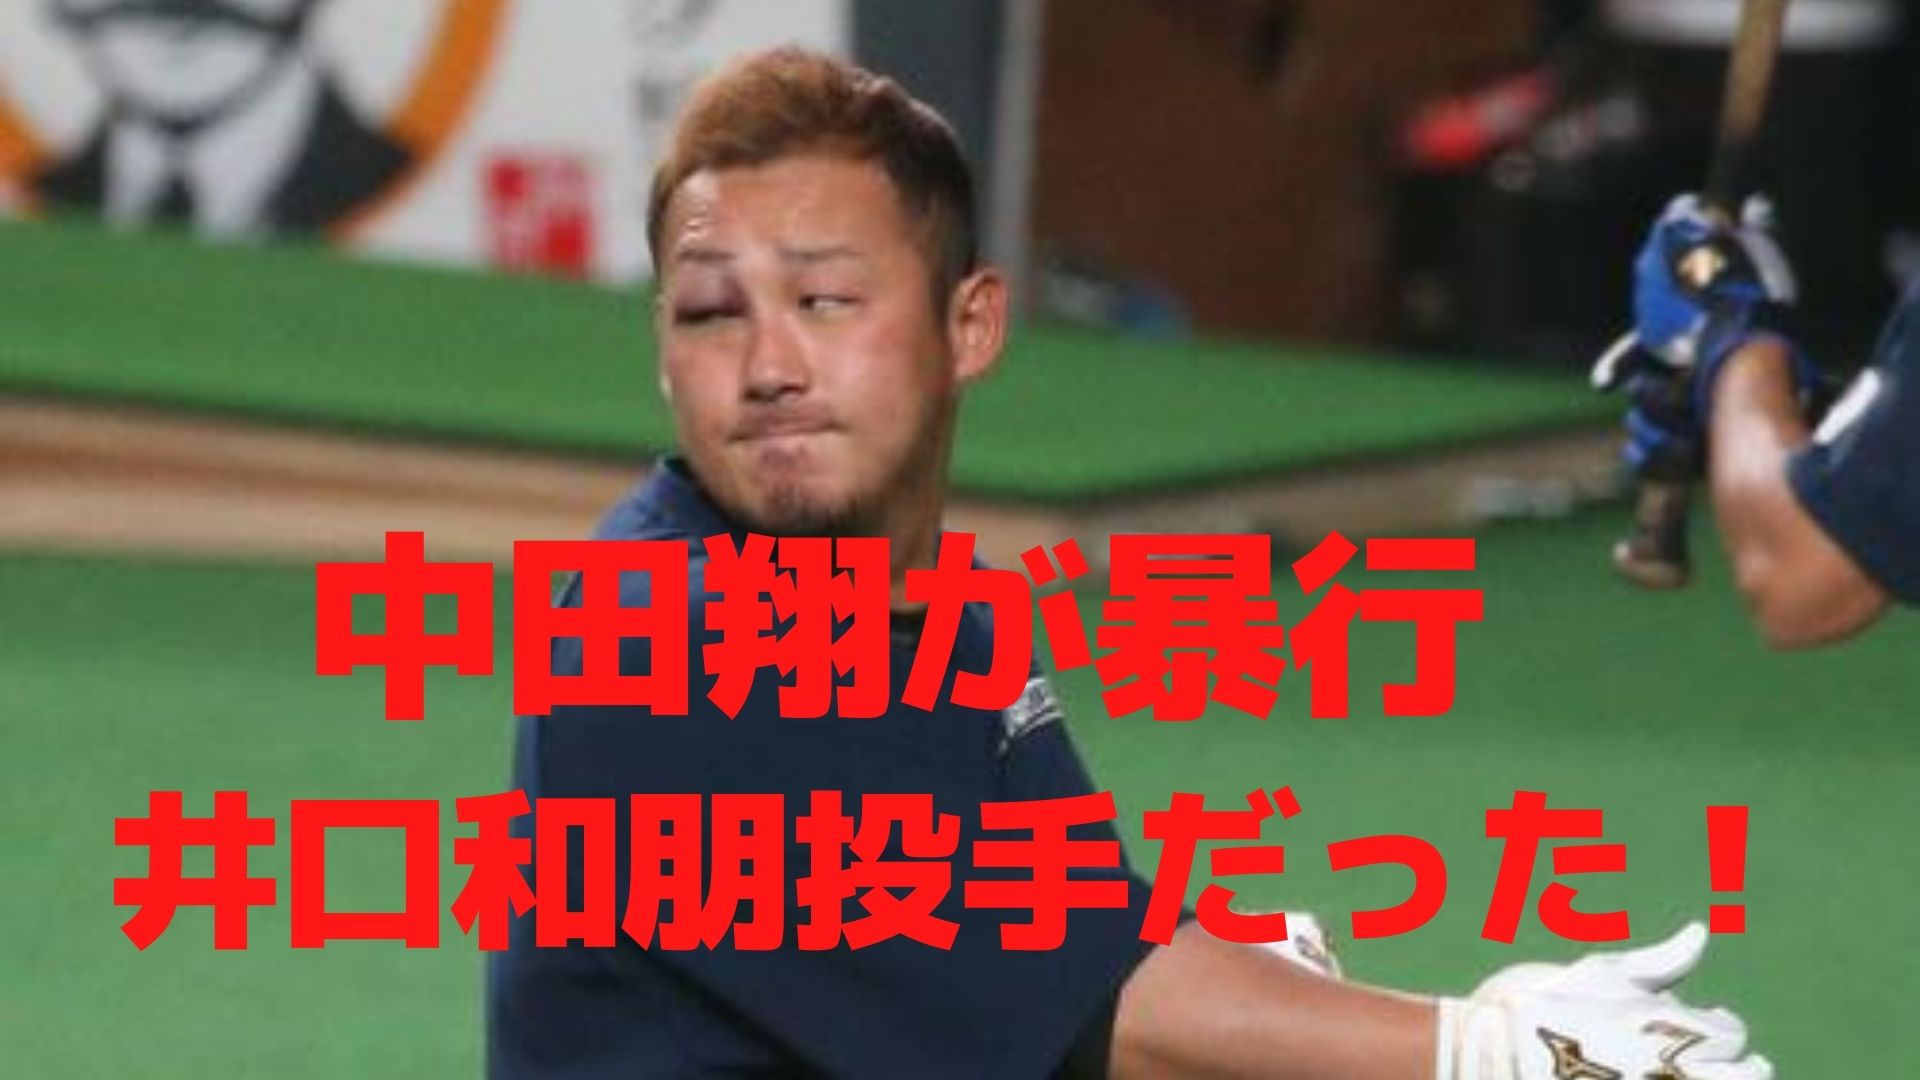 sho-nakata-assault-kenshi-sugiya